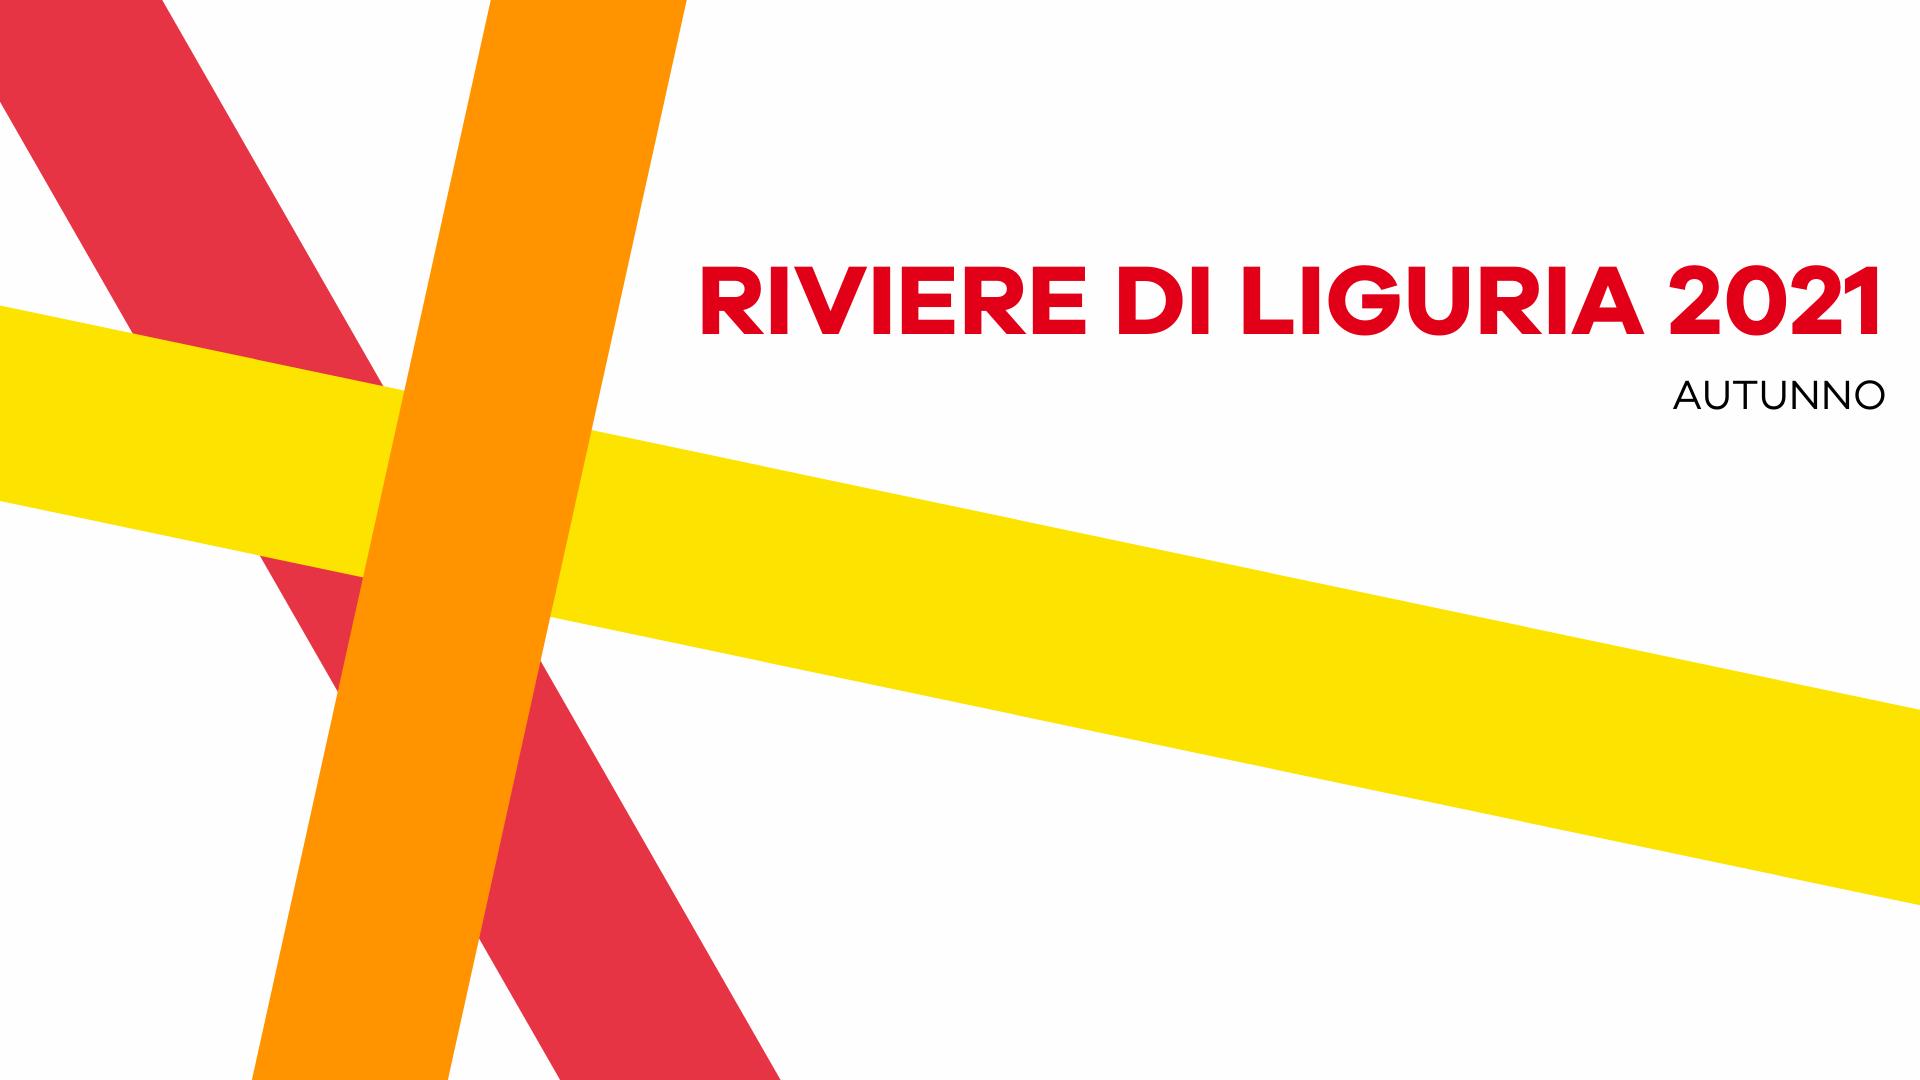 Riviere di Liguria 2021 Online